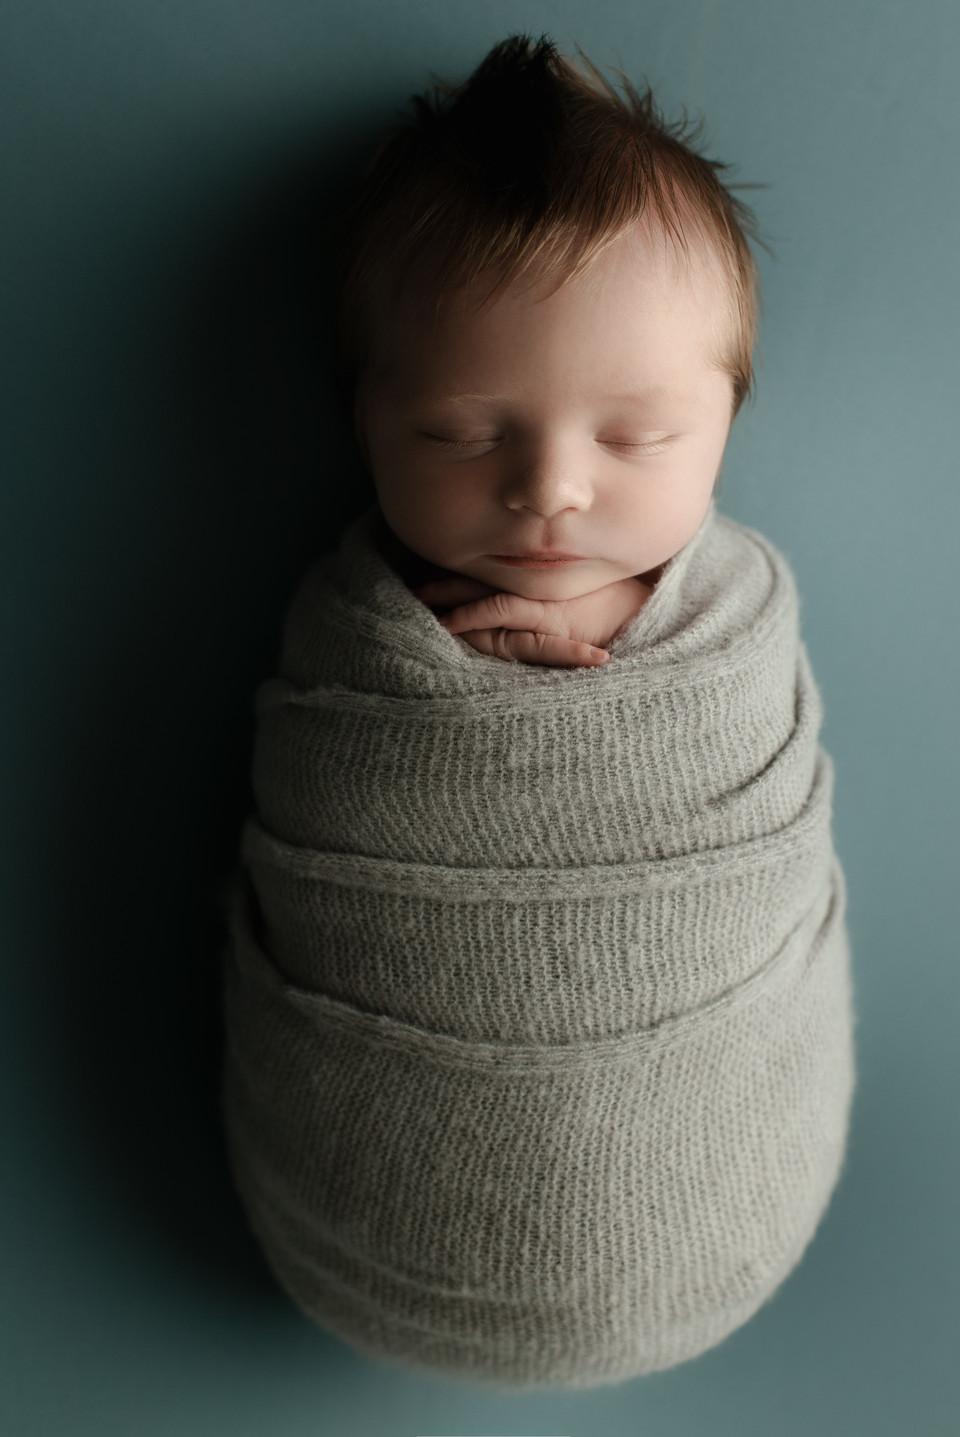 newborn photos regina, saskatchewan photographer, regina photographer, balgonie, newborn photos, baby photographer